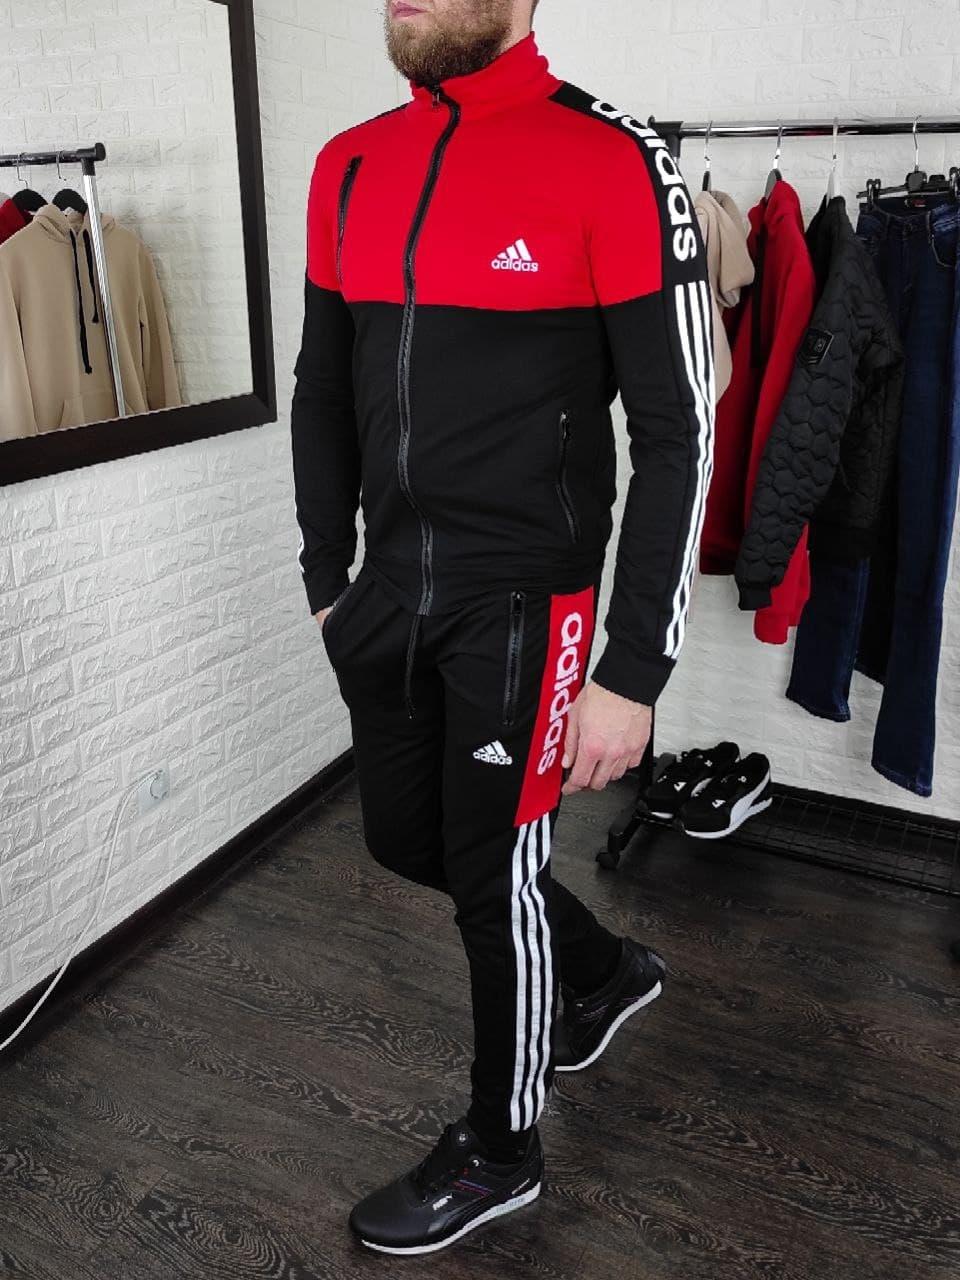 Мужской спортивный костюм Adidas без капюшона , штаны на манжетах